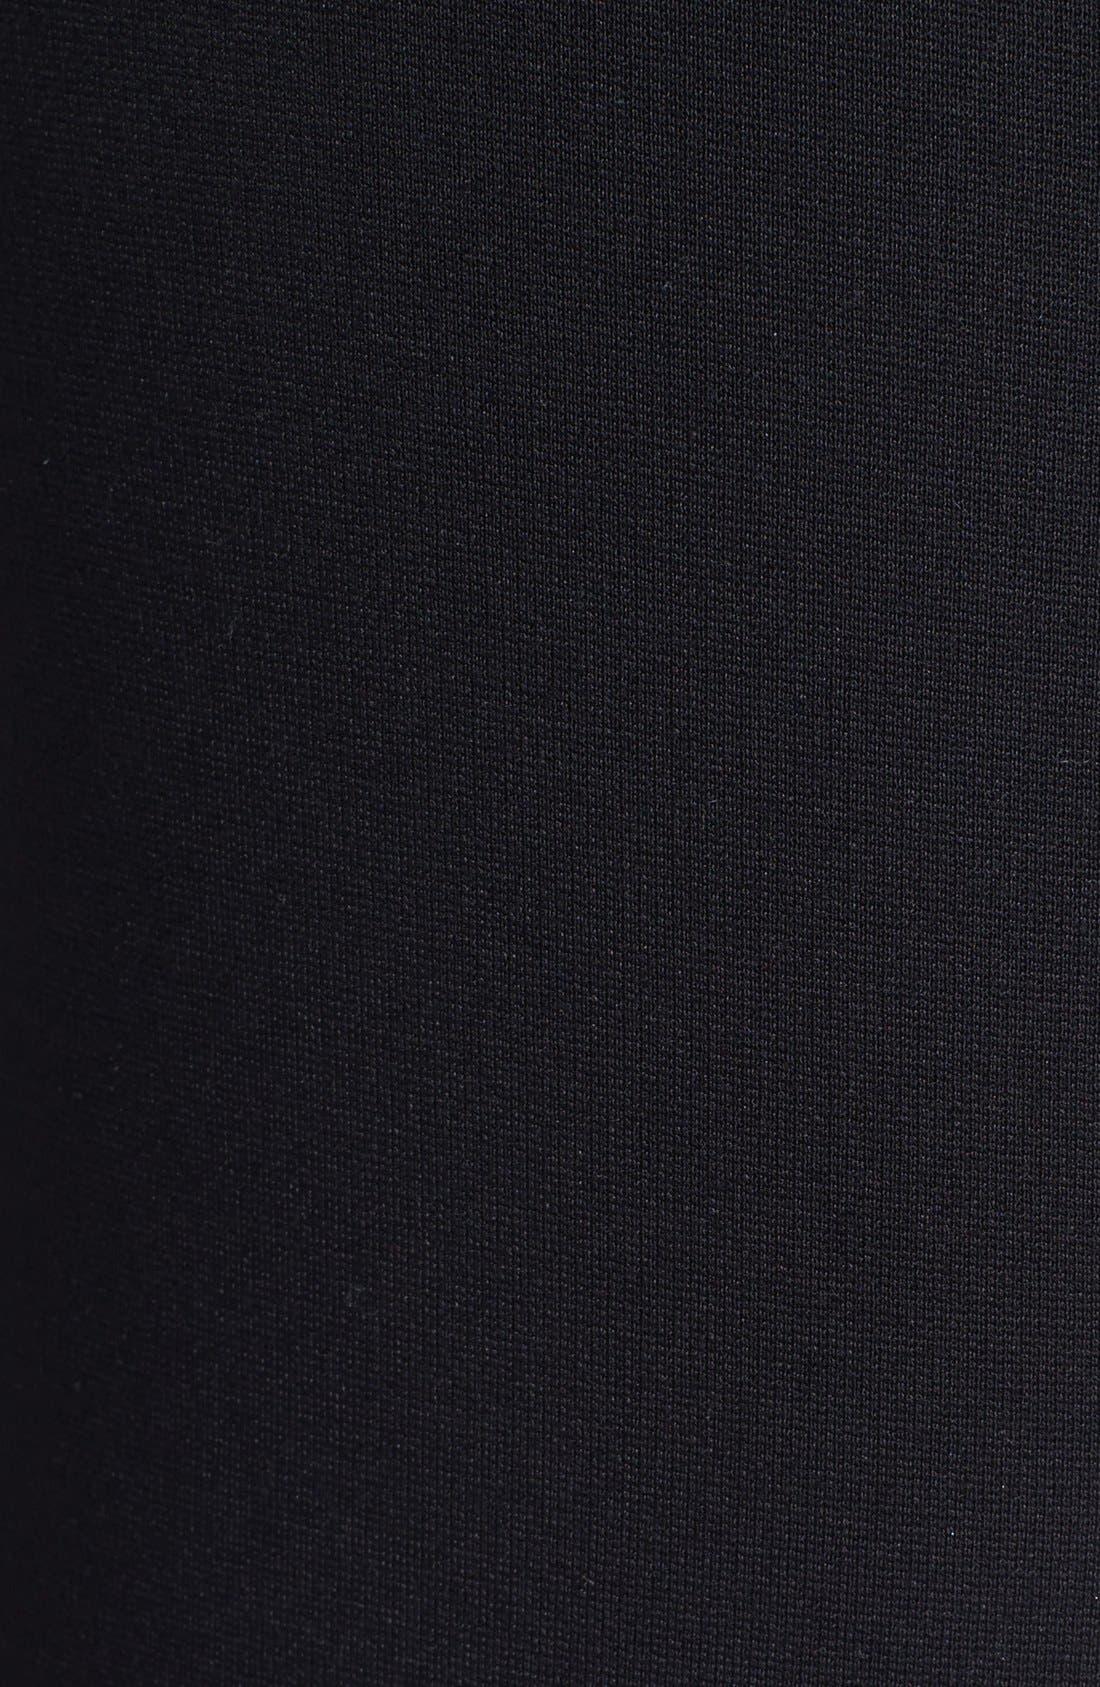 Denim 'Paloma' Faux Leather Leggings,                             Alternate thumbnail 4, color,                             001